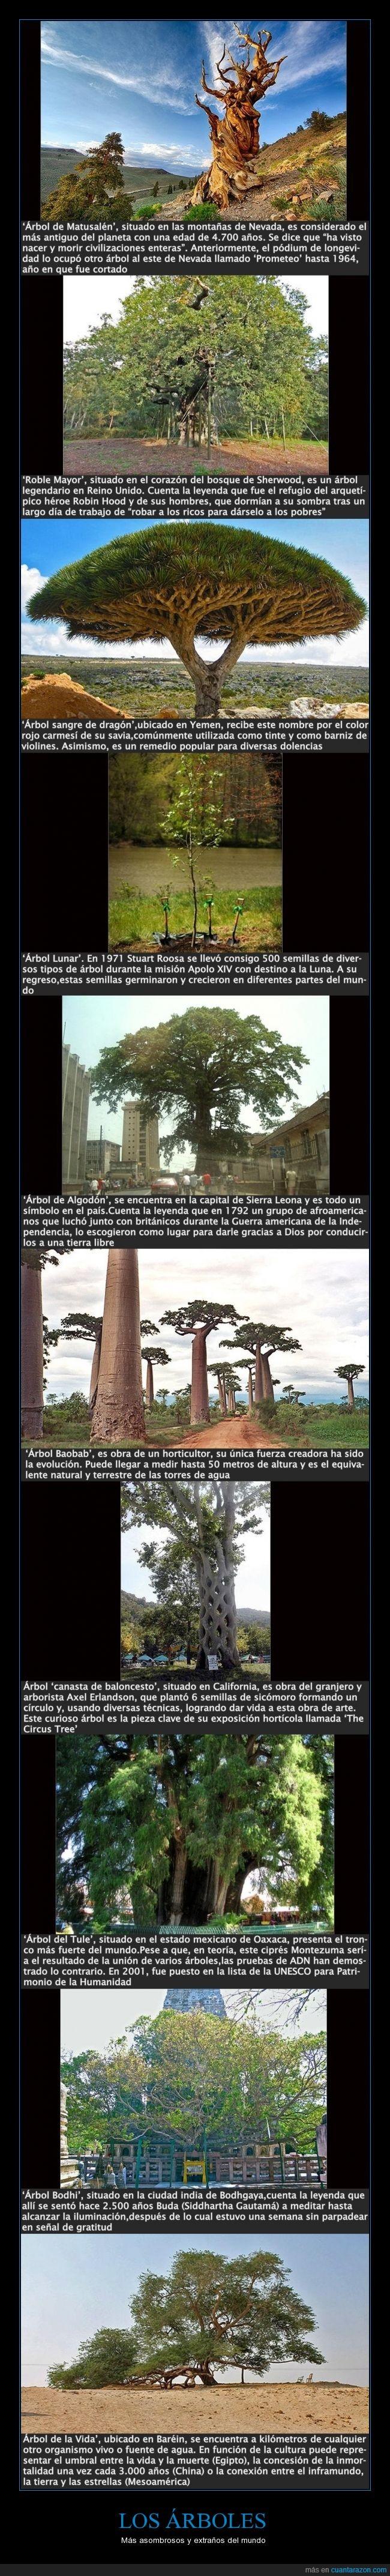 Árbol Baobab,Árbol Bodhi,Árbol canasta de baloncesto,Árbol de Algodón,Árbol de la Vida,Árbol de Matusalén,Árbol del Tule,Árbol Lunar,Árbol sangre de dragón,árboles,asombrosos,Axel Erlandson,Baréin,Bodhgaya,bonitos,bosque de Sherwood,Buda,California,ciprés Montezuma,curiosos,EE.UU.,extraños,impactantes,increíbles,India,montañas de Nevada,Oaxaca,raros,Robin Hood,Roble Mayor,Siddhartha Gautamá,Sierra Leona,Stuart Roosa,Yemen